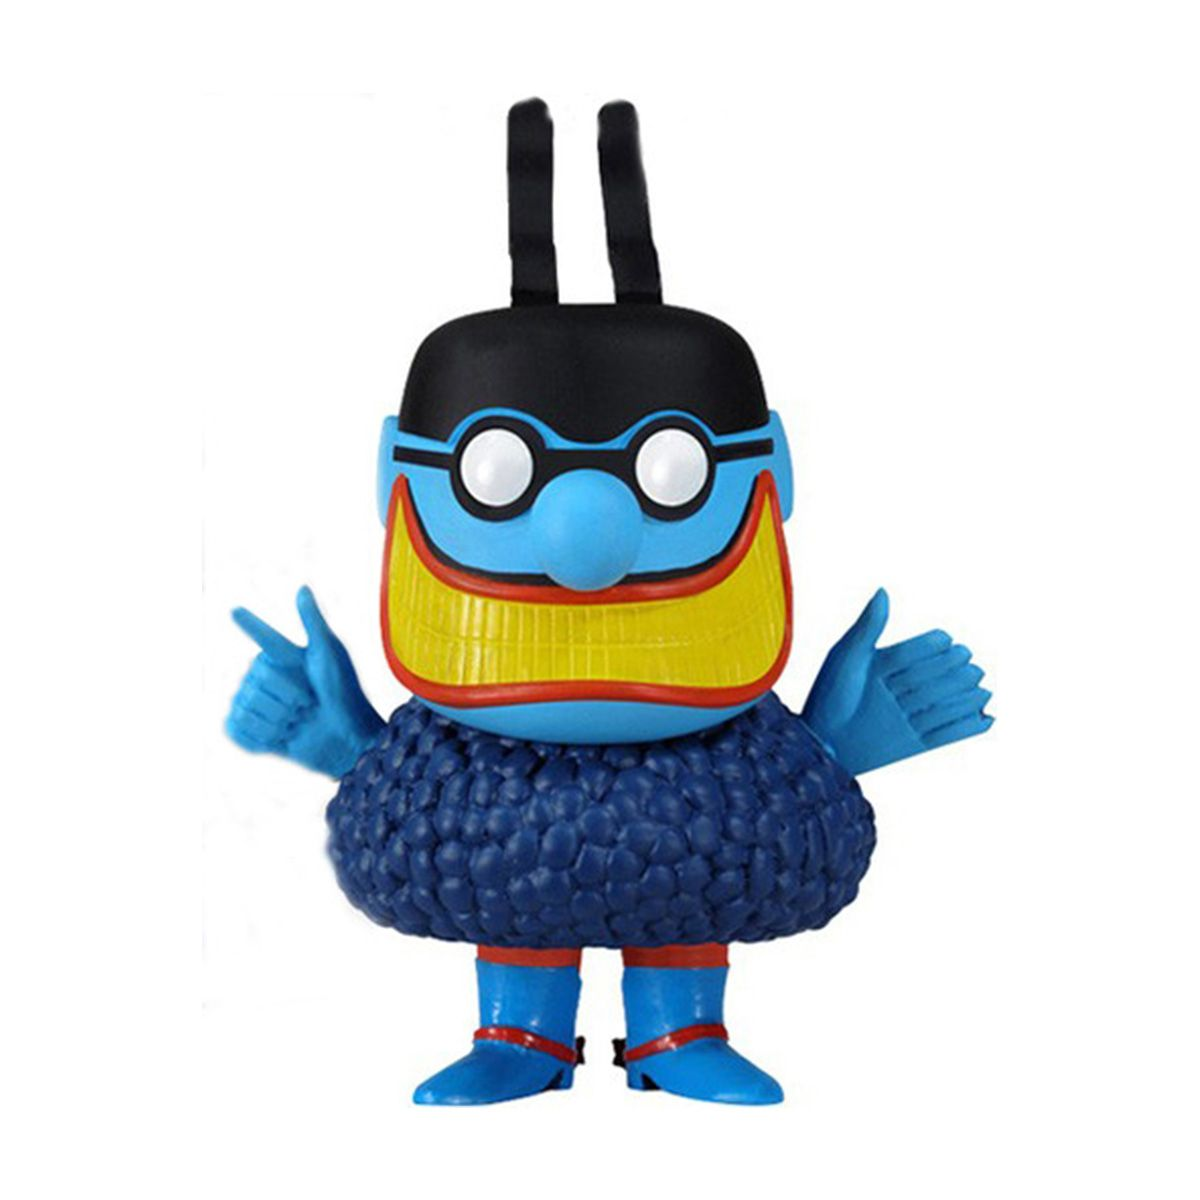 Boneco Funko The Beatles Yellow Submarine Blue Meanie